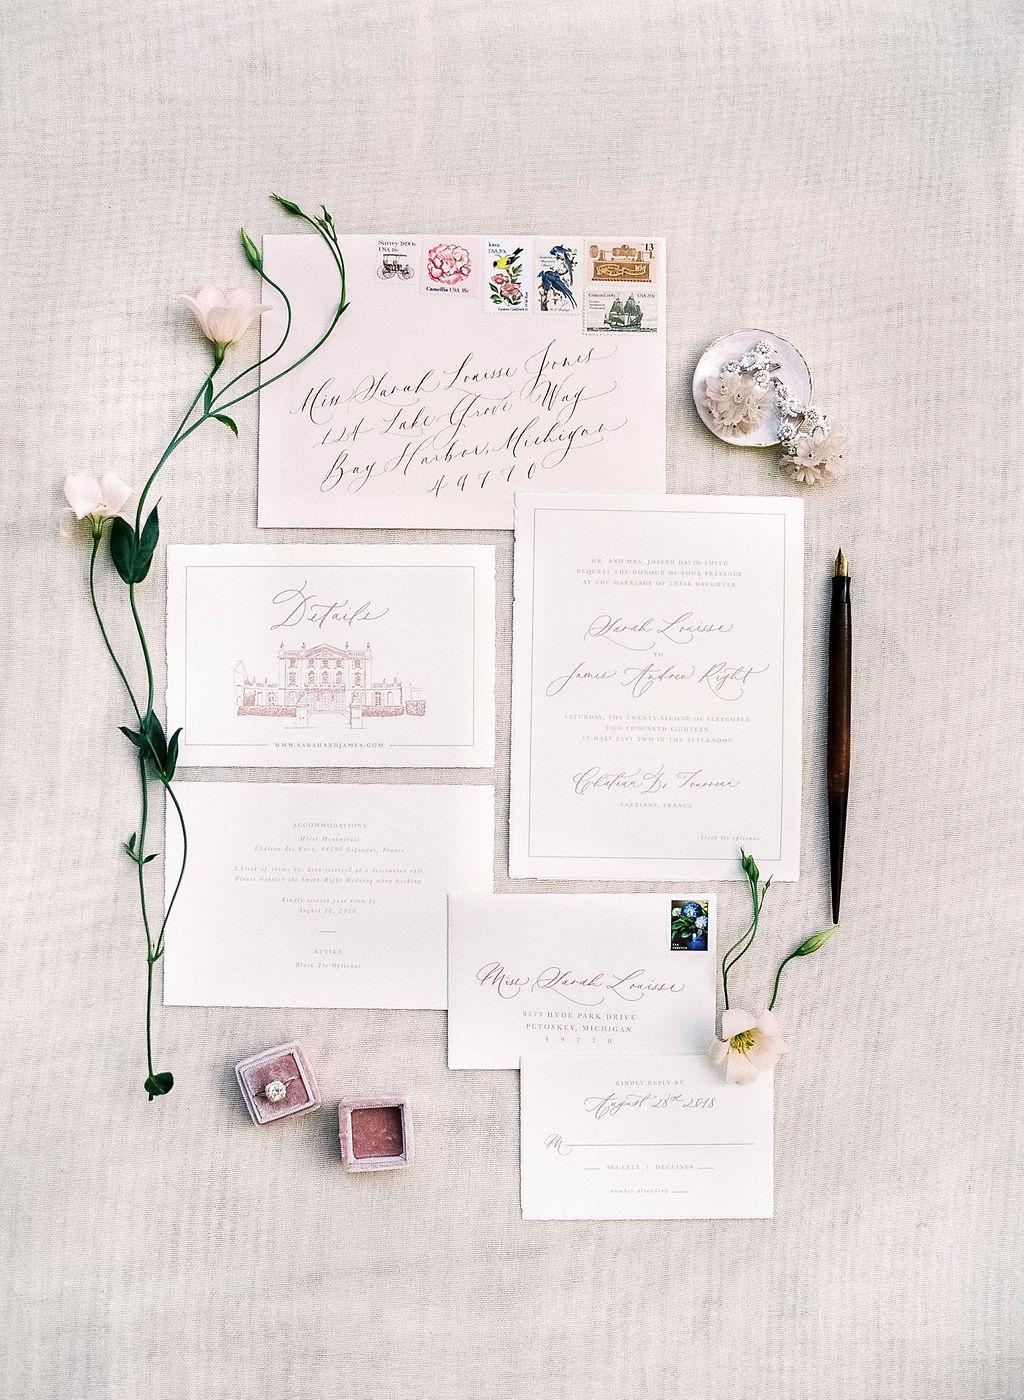 wedding trends 2019 invitationcard trends 2019